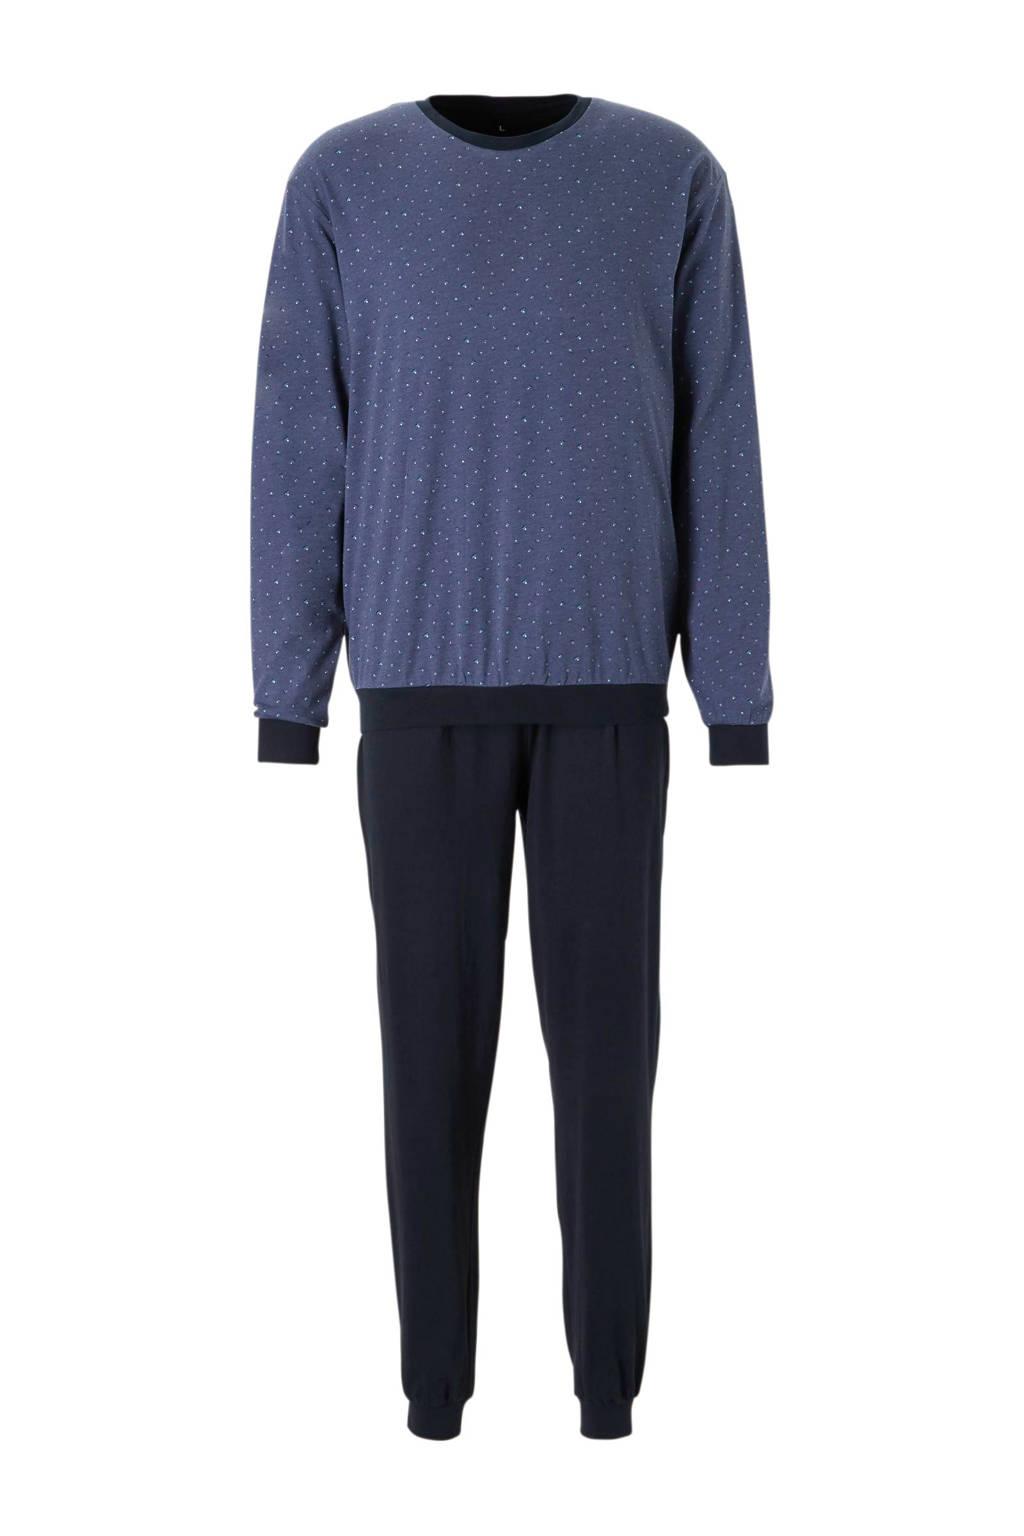 C&A Canda pyjama met print blauw, Blauw/donkerblauw